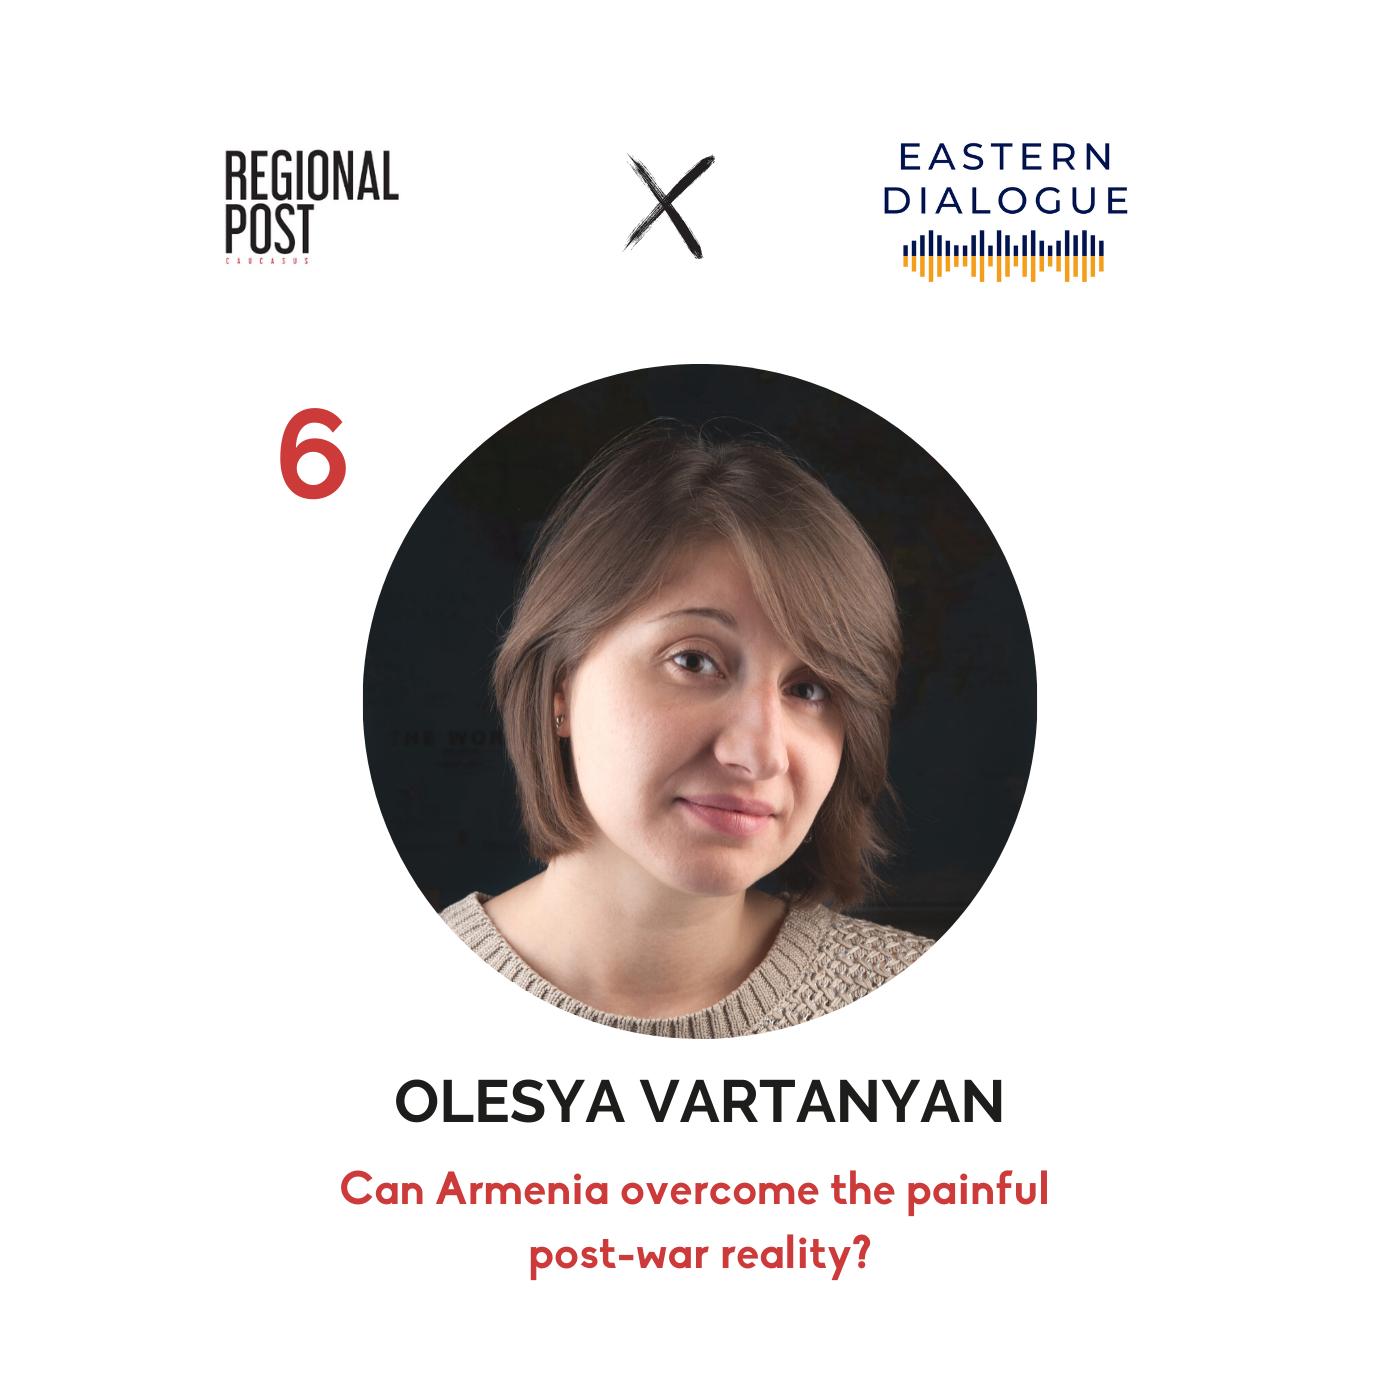 Olesya Vartanyan - Can Armenia overcome the painful post-war reality?